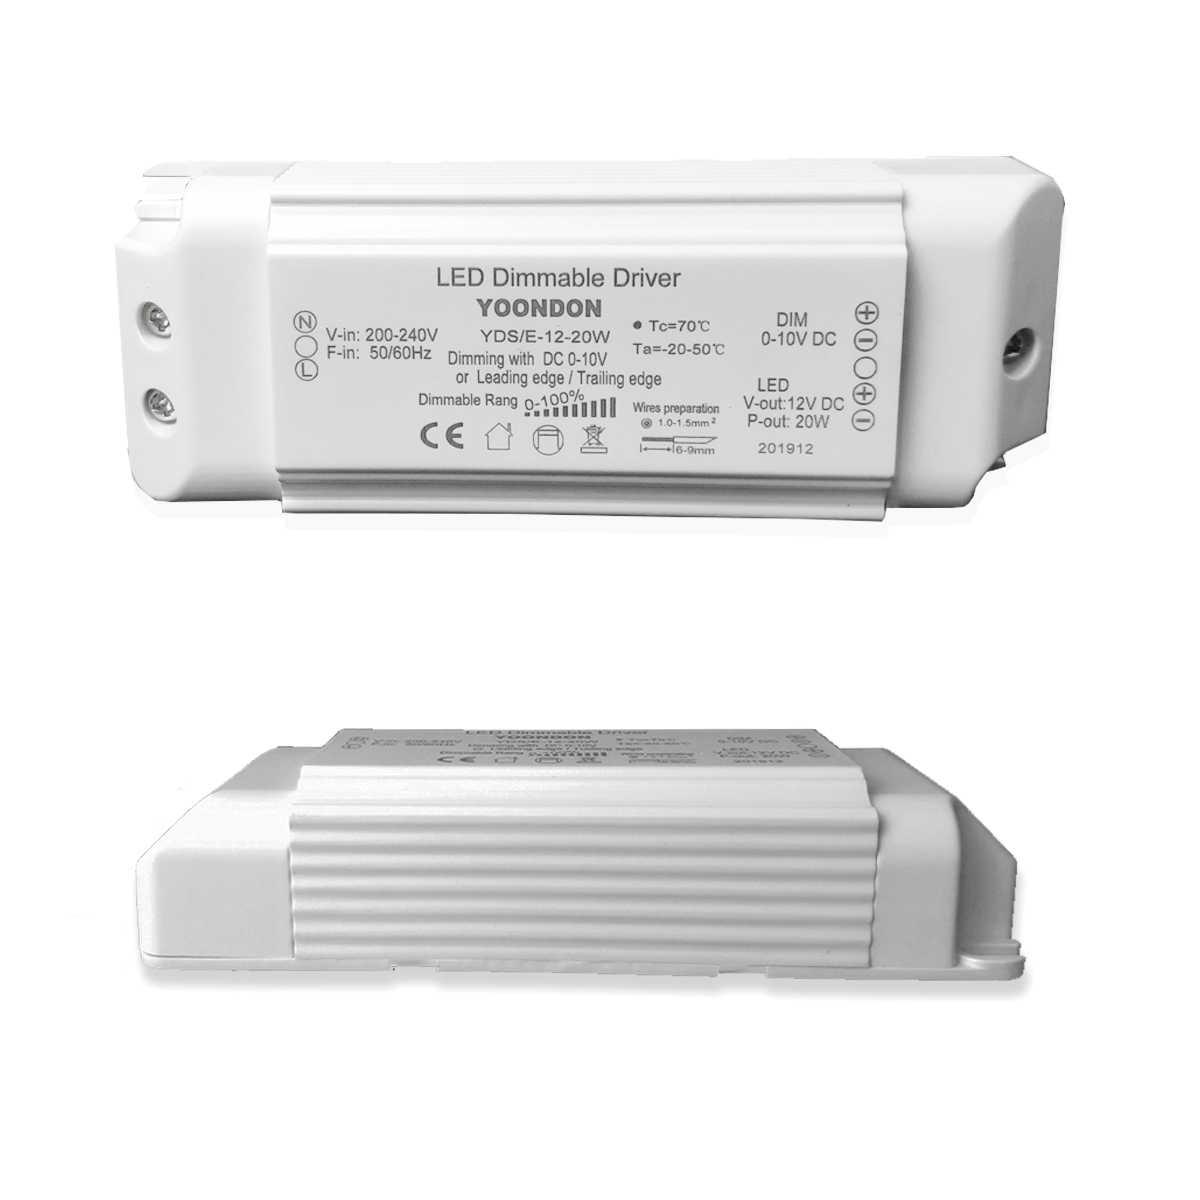 Kunststoff 230 V 12 V AC Dimmbarer IP40 Transformator weiß 105 VA